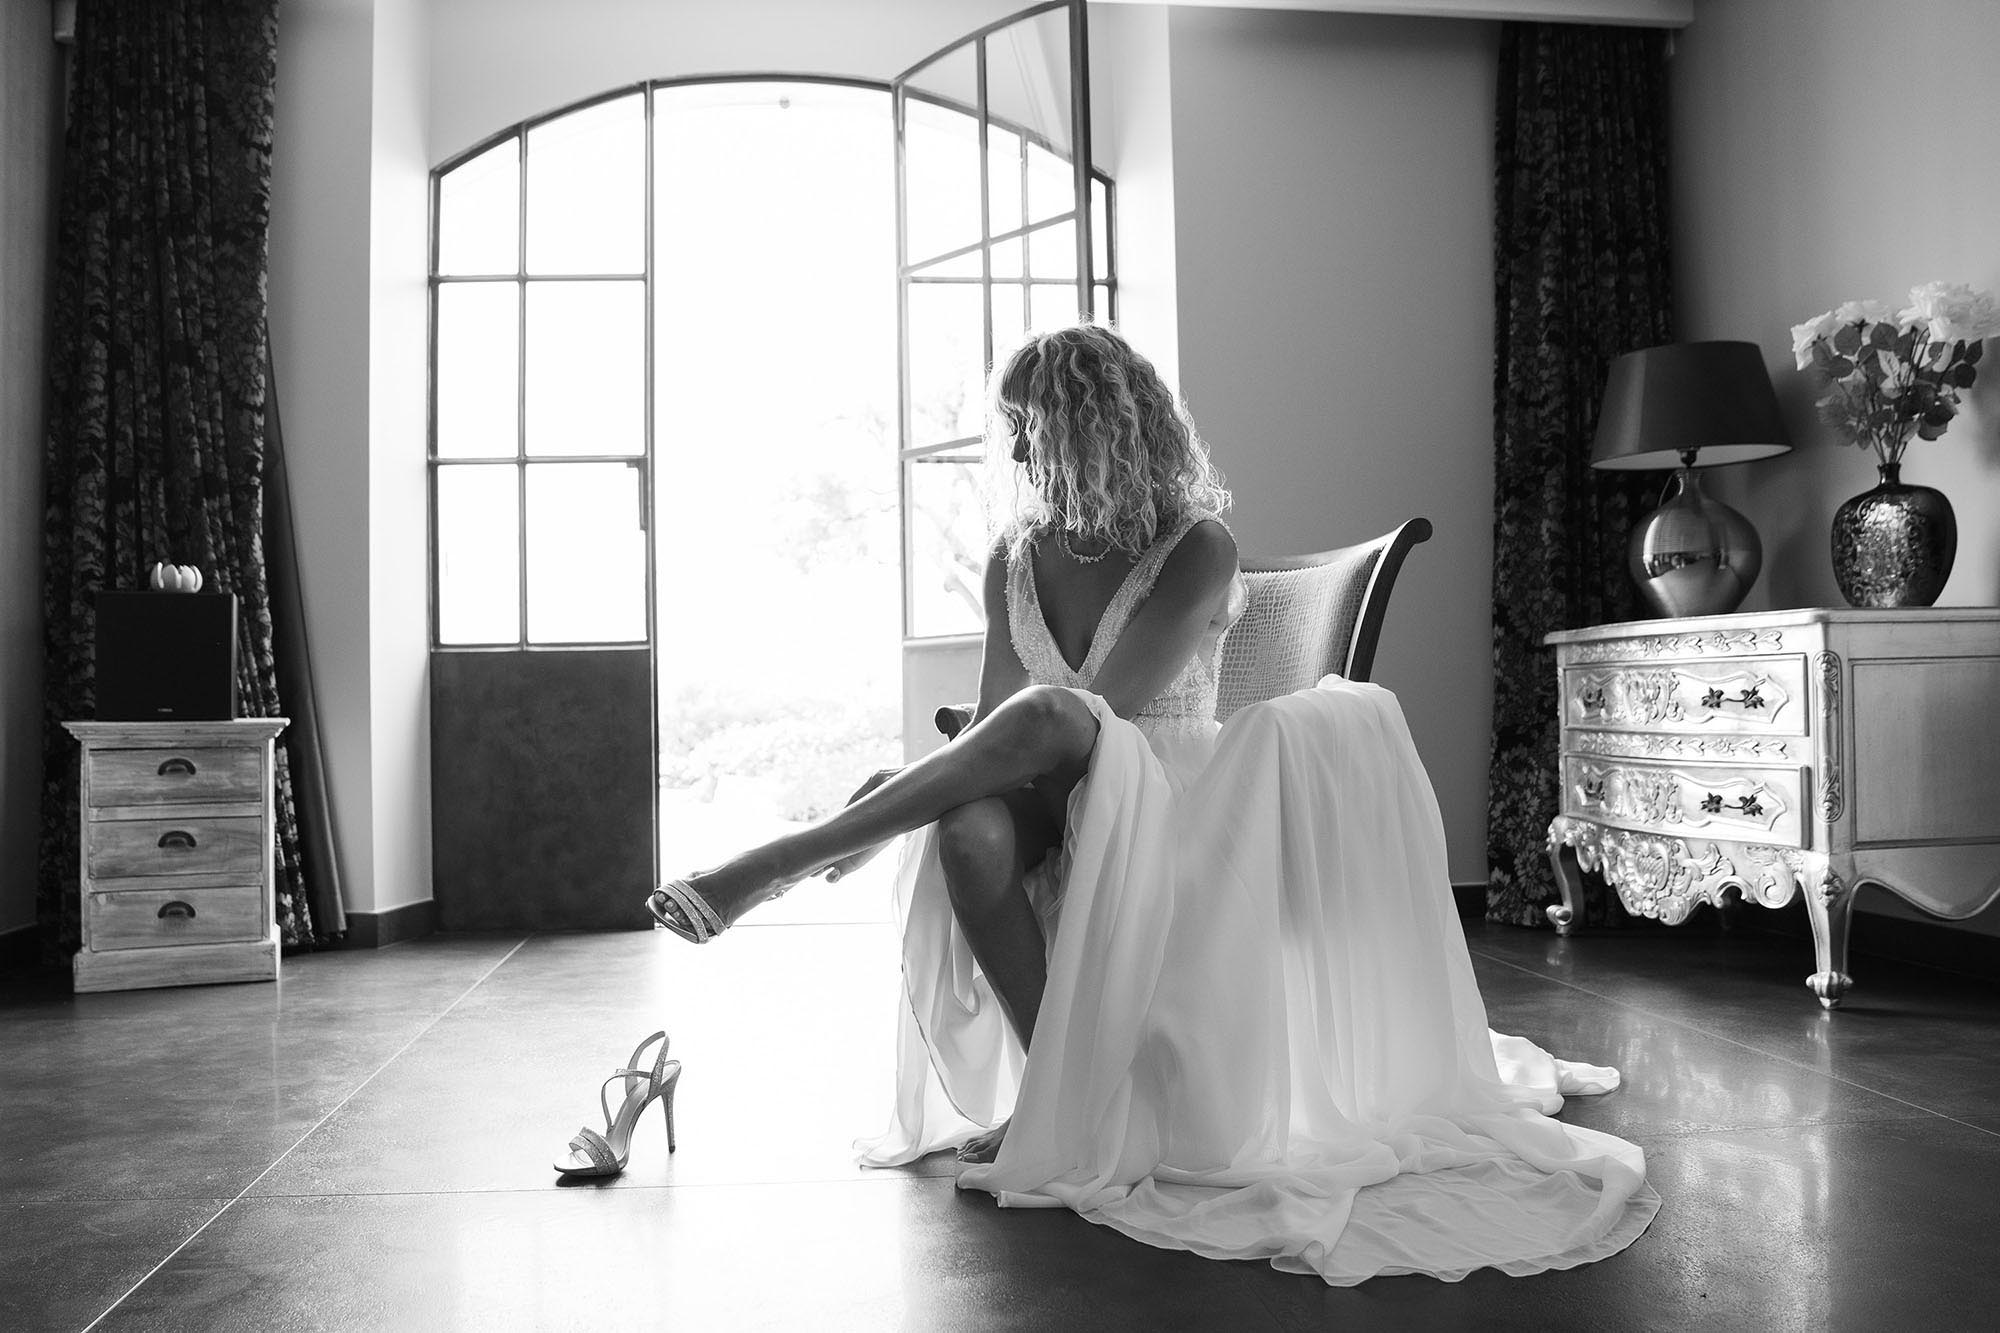 photographe-mariage-preparatif-pertuis-vaucluse